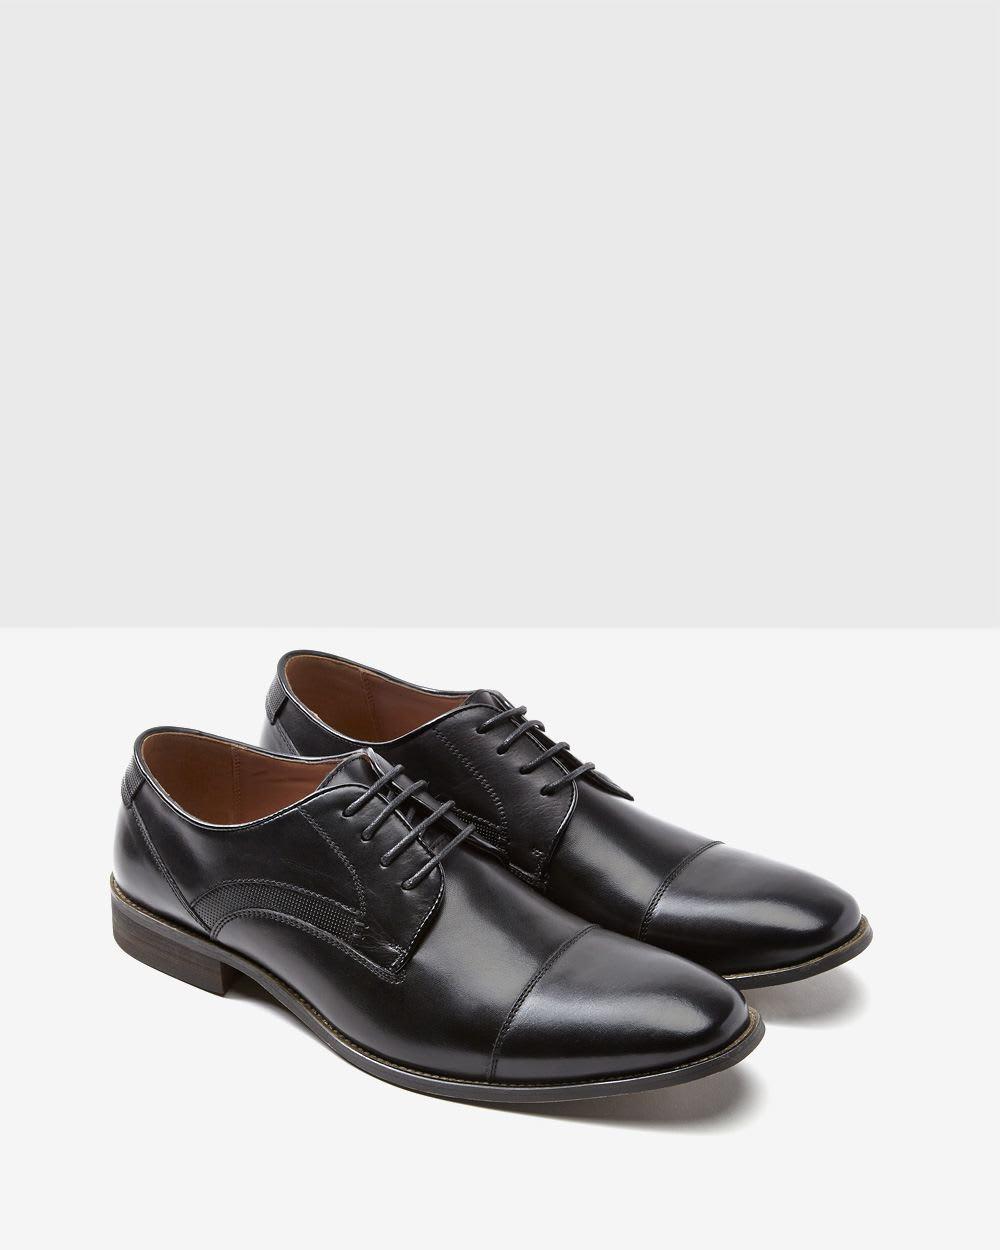 e58a4ba4436 Steve Madden (TM) - Oxford Dress Shoe